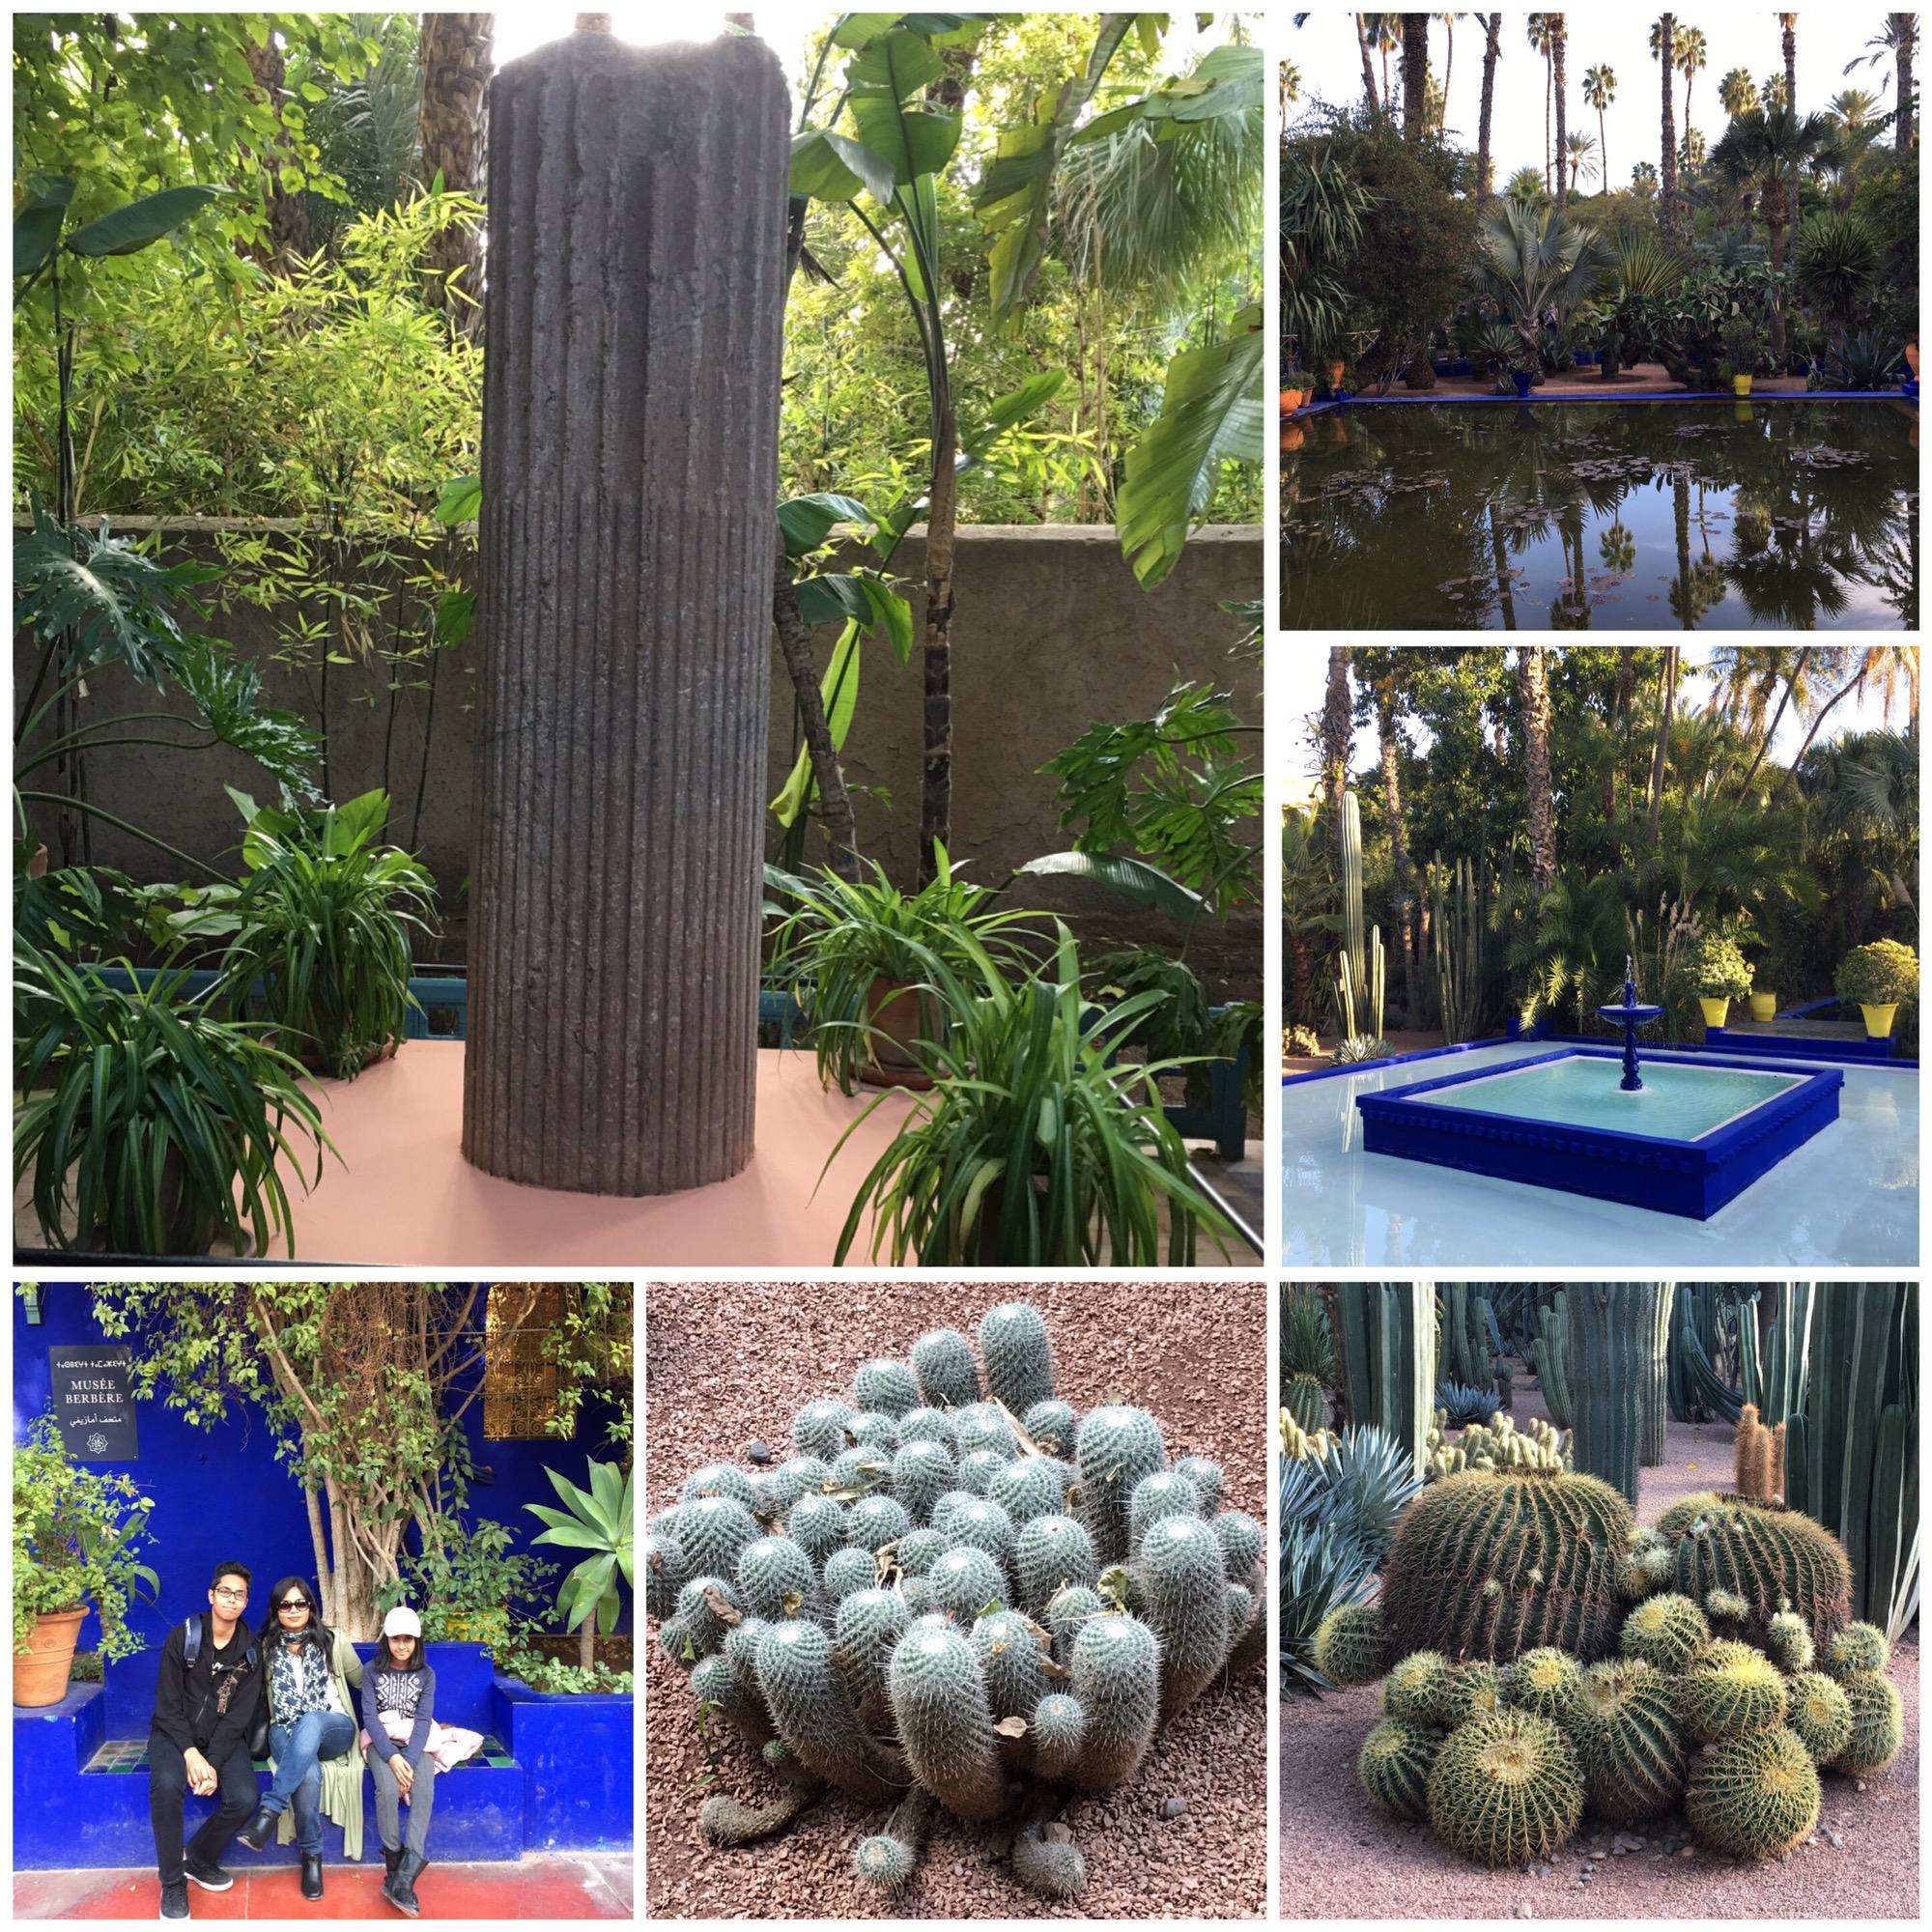 Jardin Yves Saint Laurent Marrakech: Jardin Majorelle In Marrakech-Is It Worth Visiting